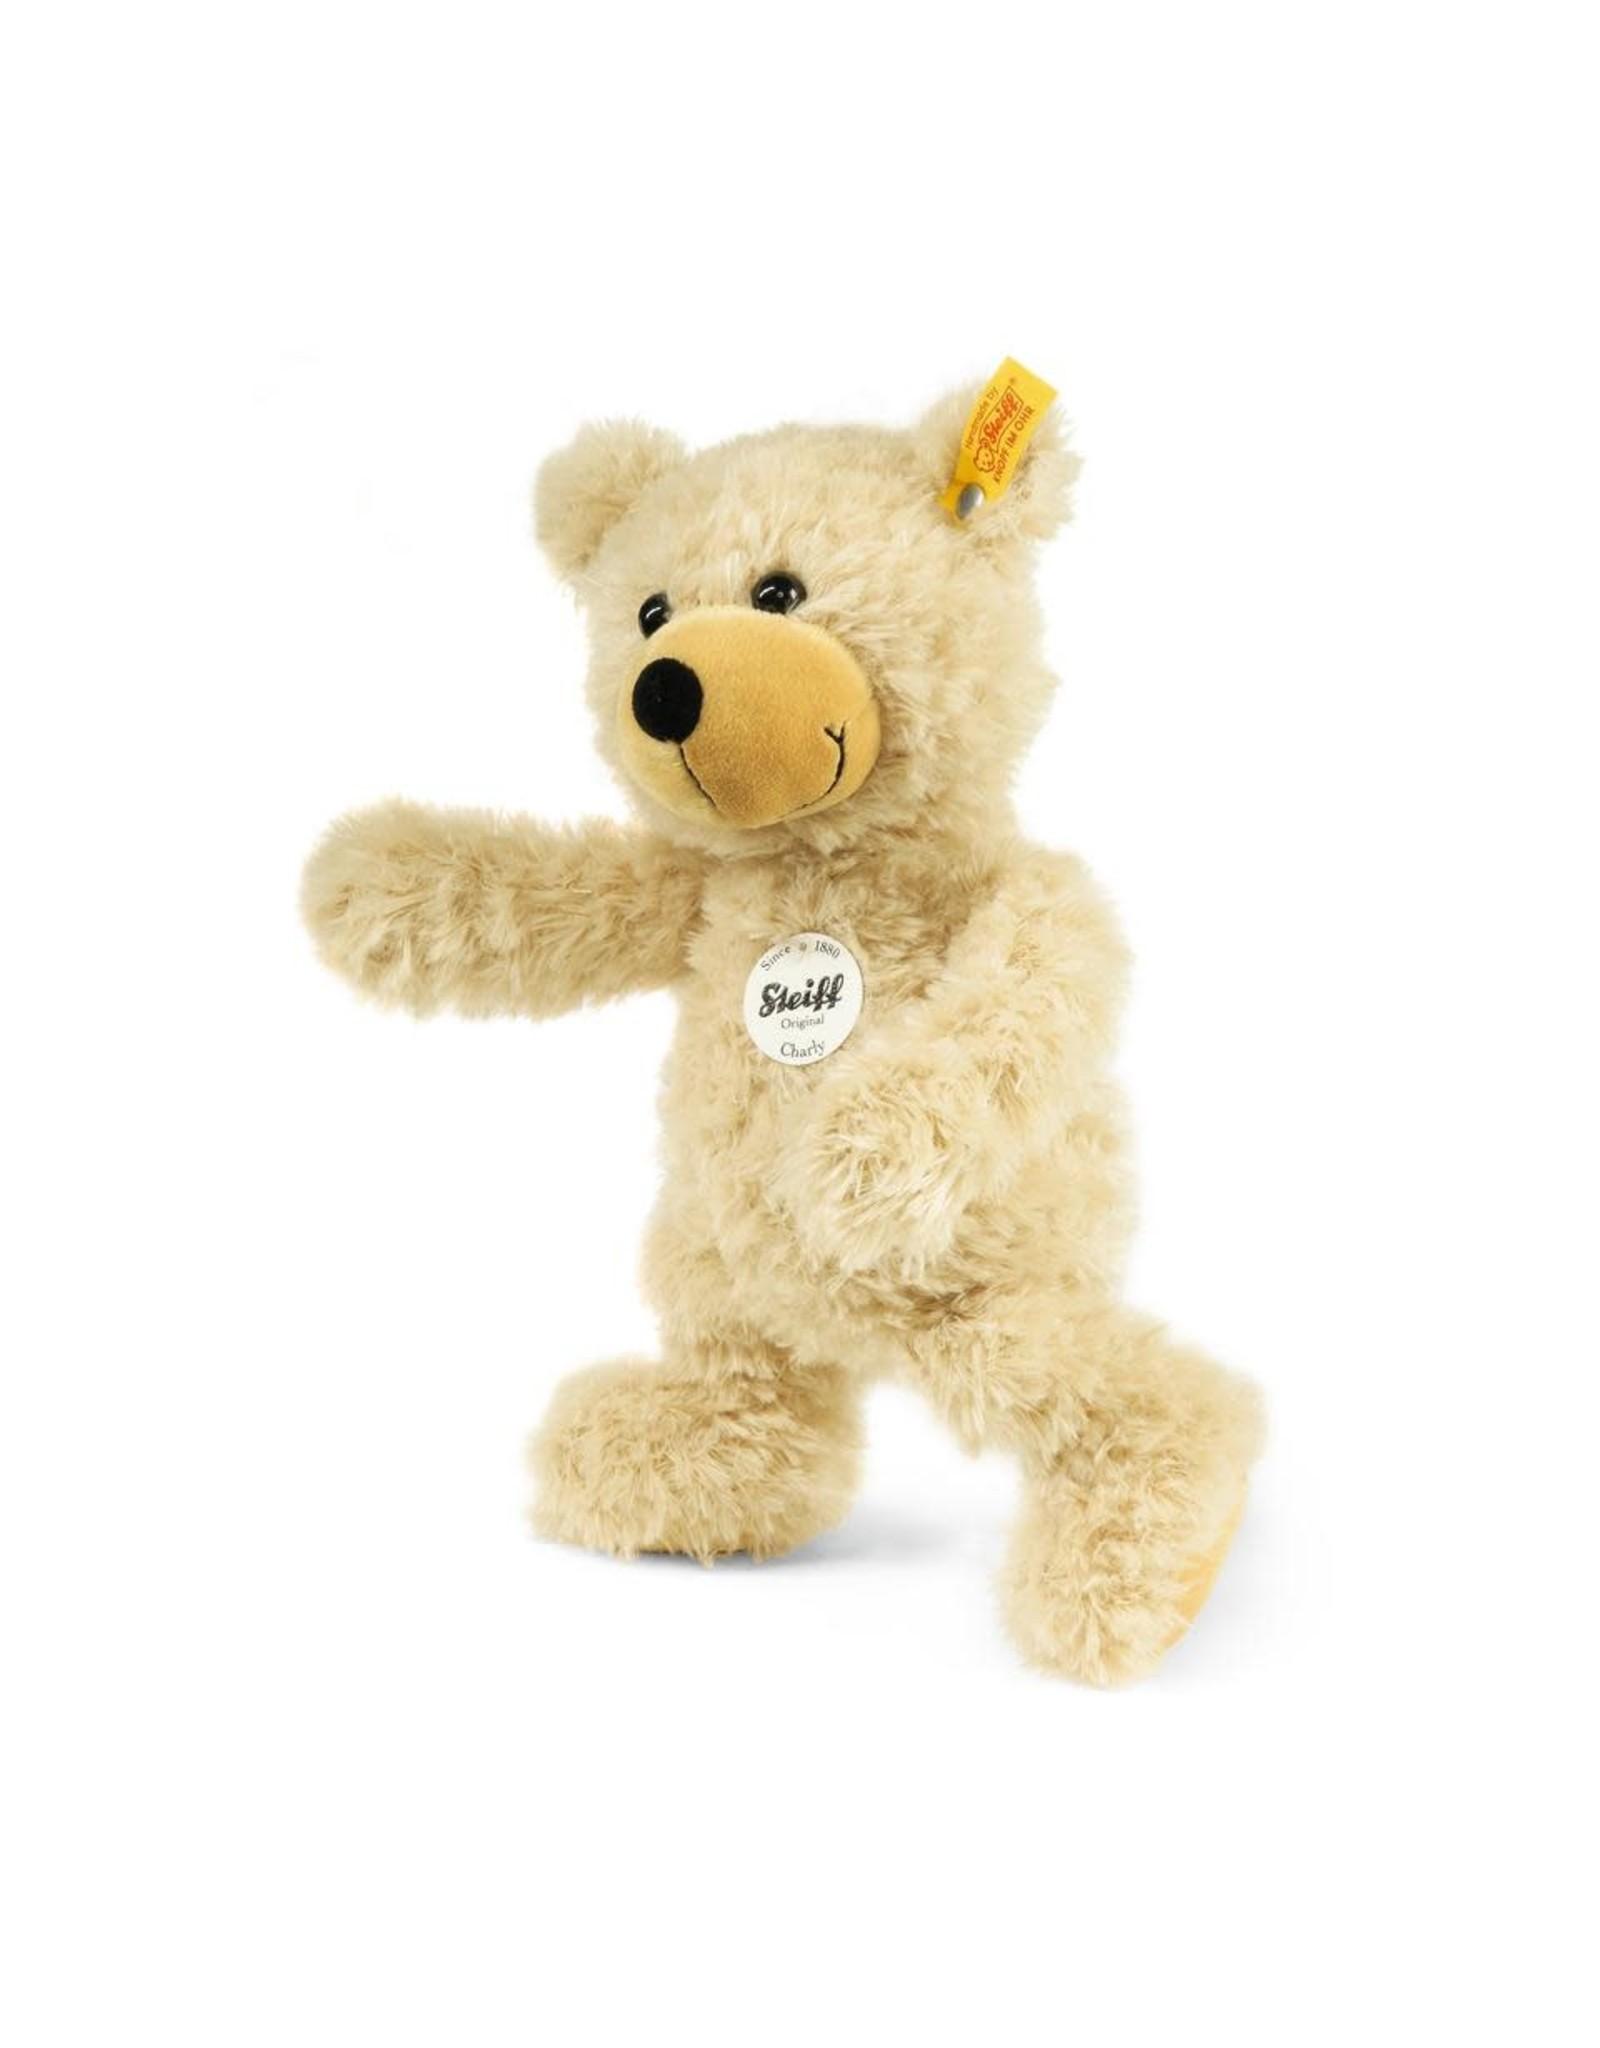 Steiff Charly Teddy Beige - Steiff 012808